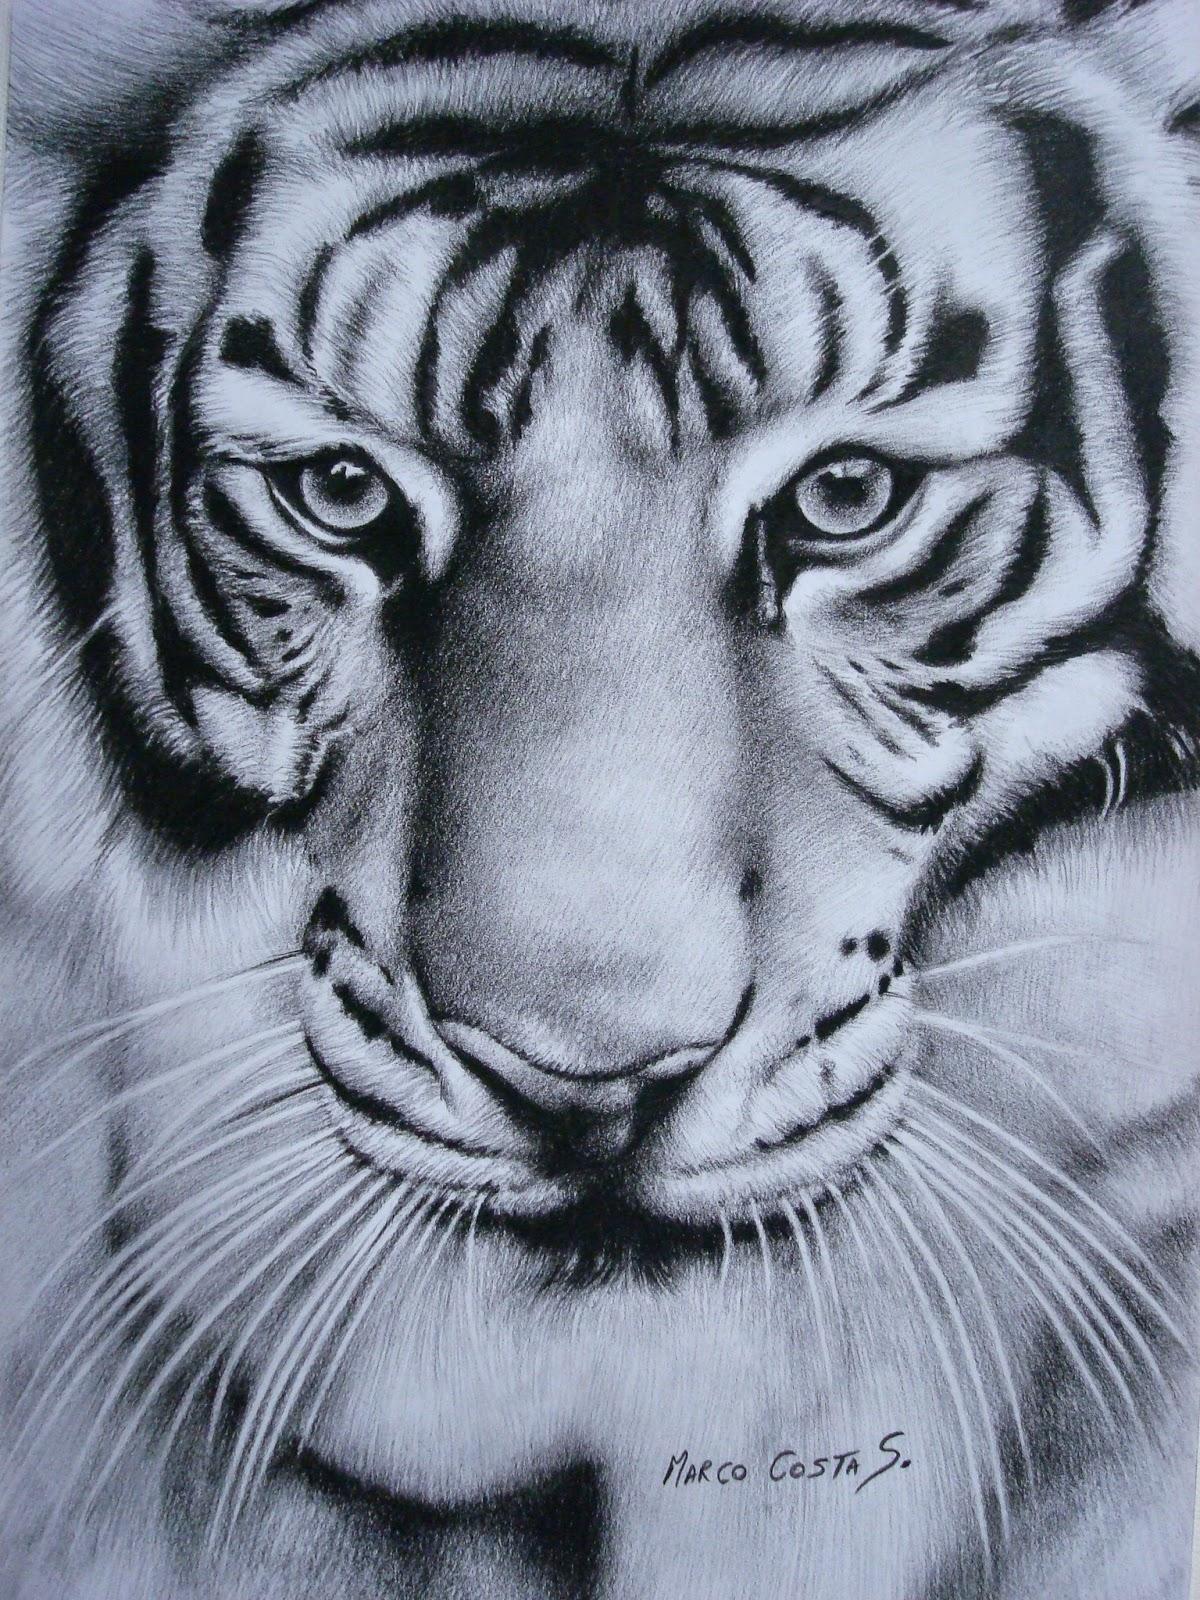 Marco Costa Artista Visual: Dibujo de Tigre de Bengala